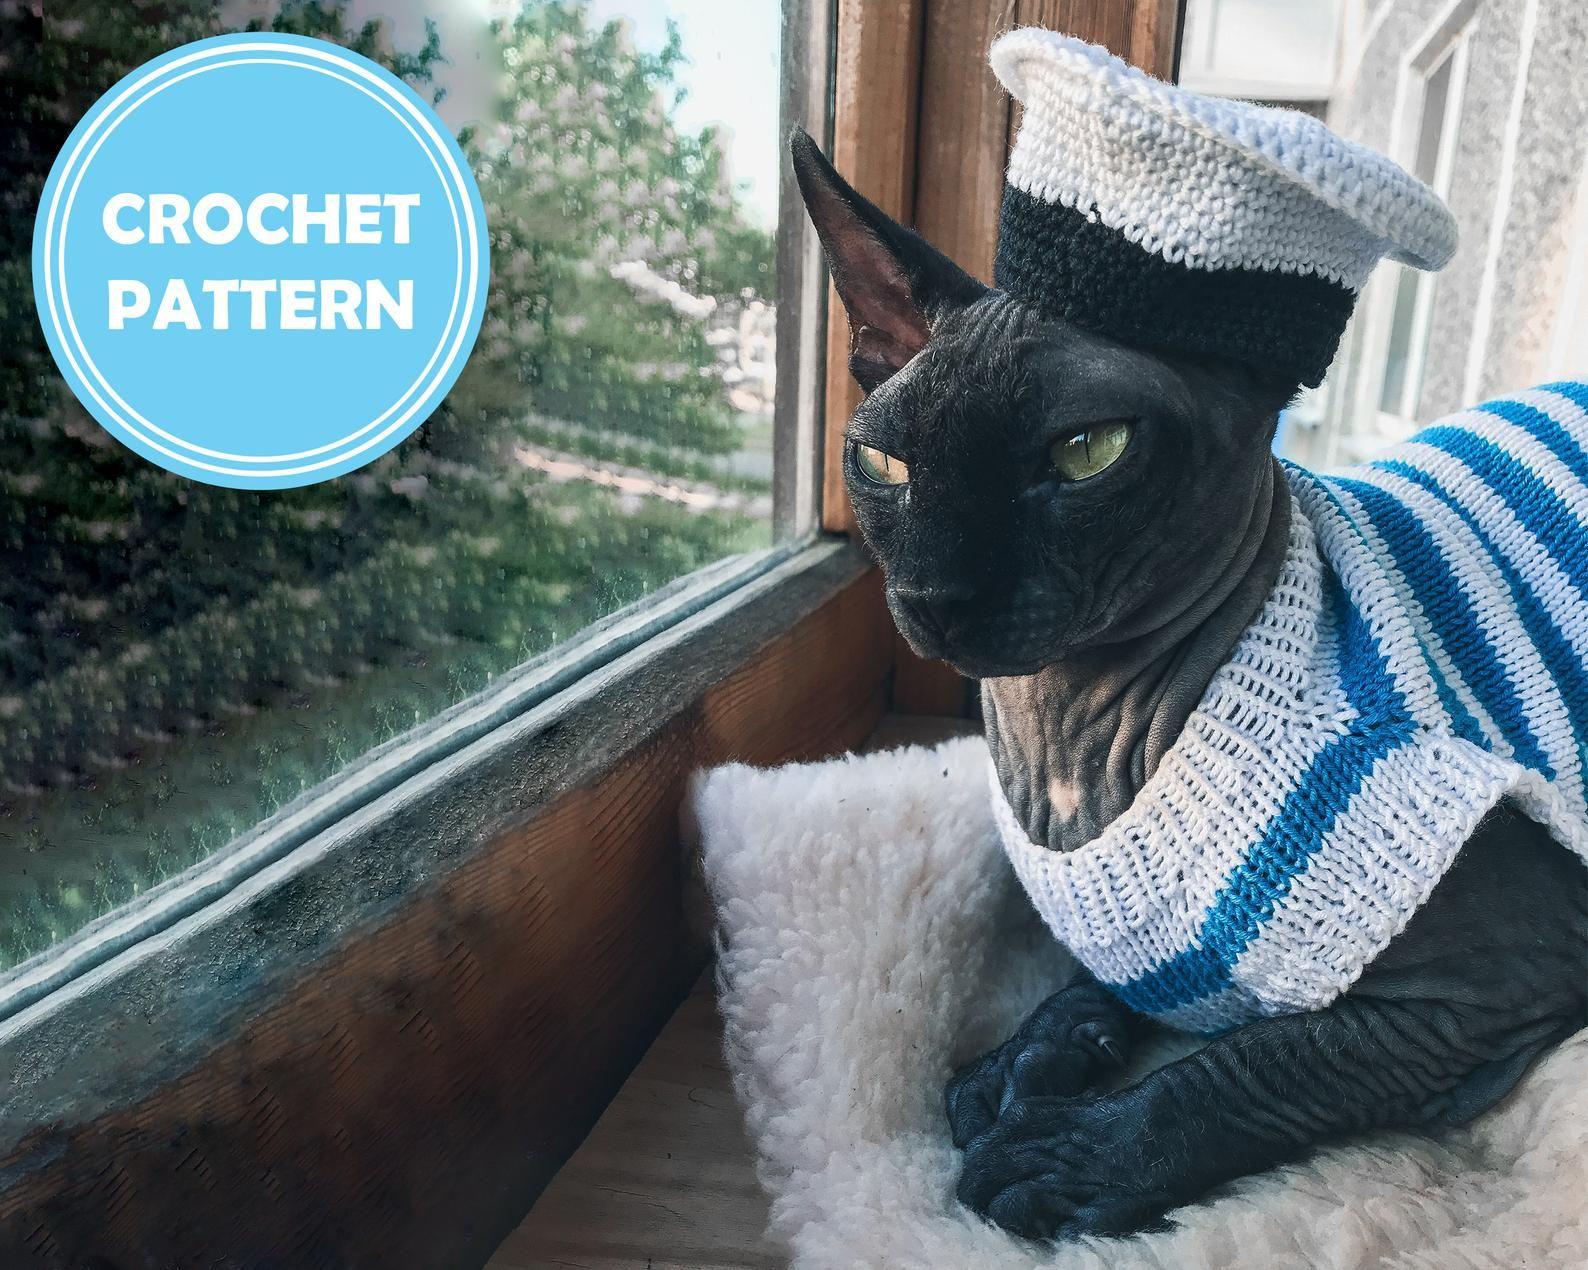 Cat Sailor Hat Crochet Pattern Pdf Small Sailor Hat Accessory For Sphynx In 2021 Crochet Hat Pattern Crochet Hats Cat Sweater Knitting Pattern